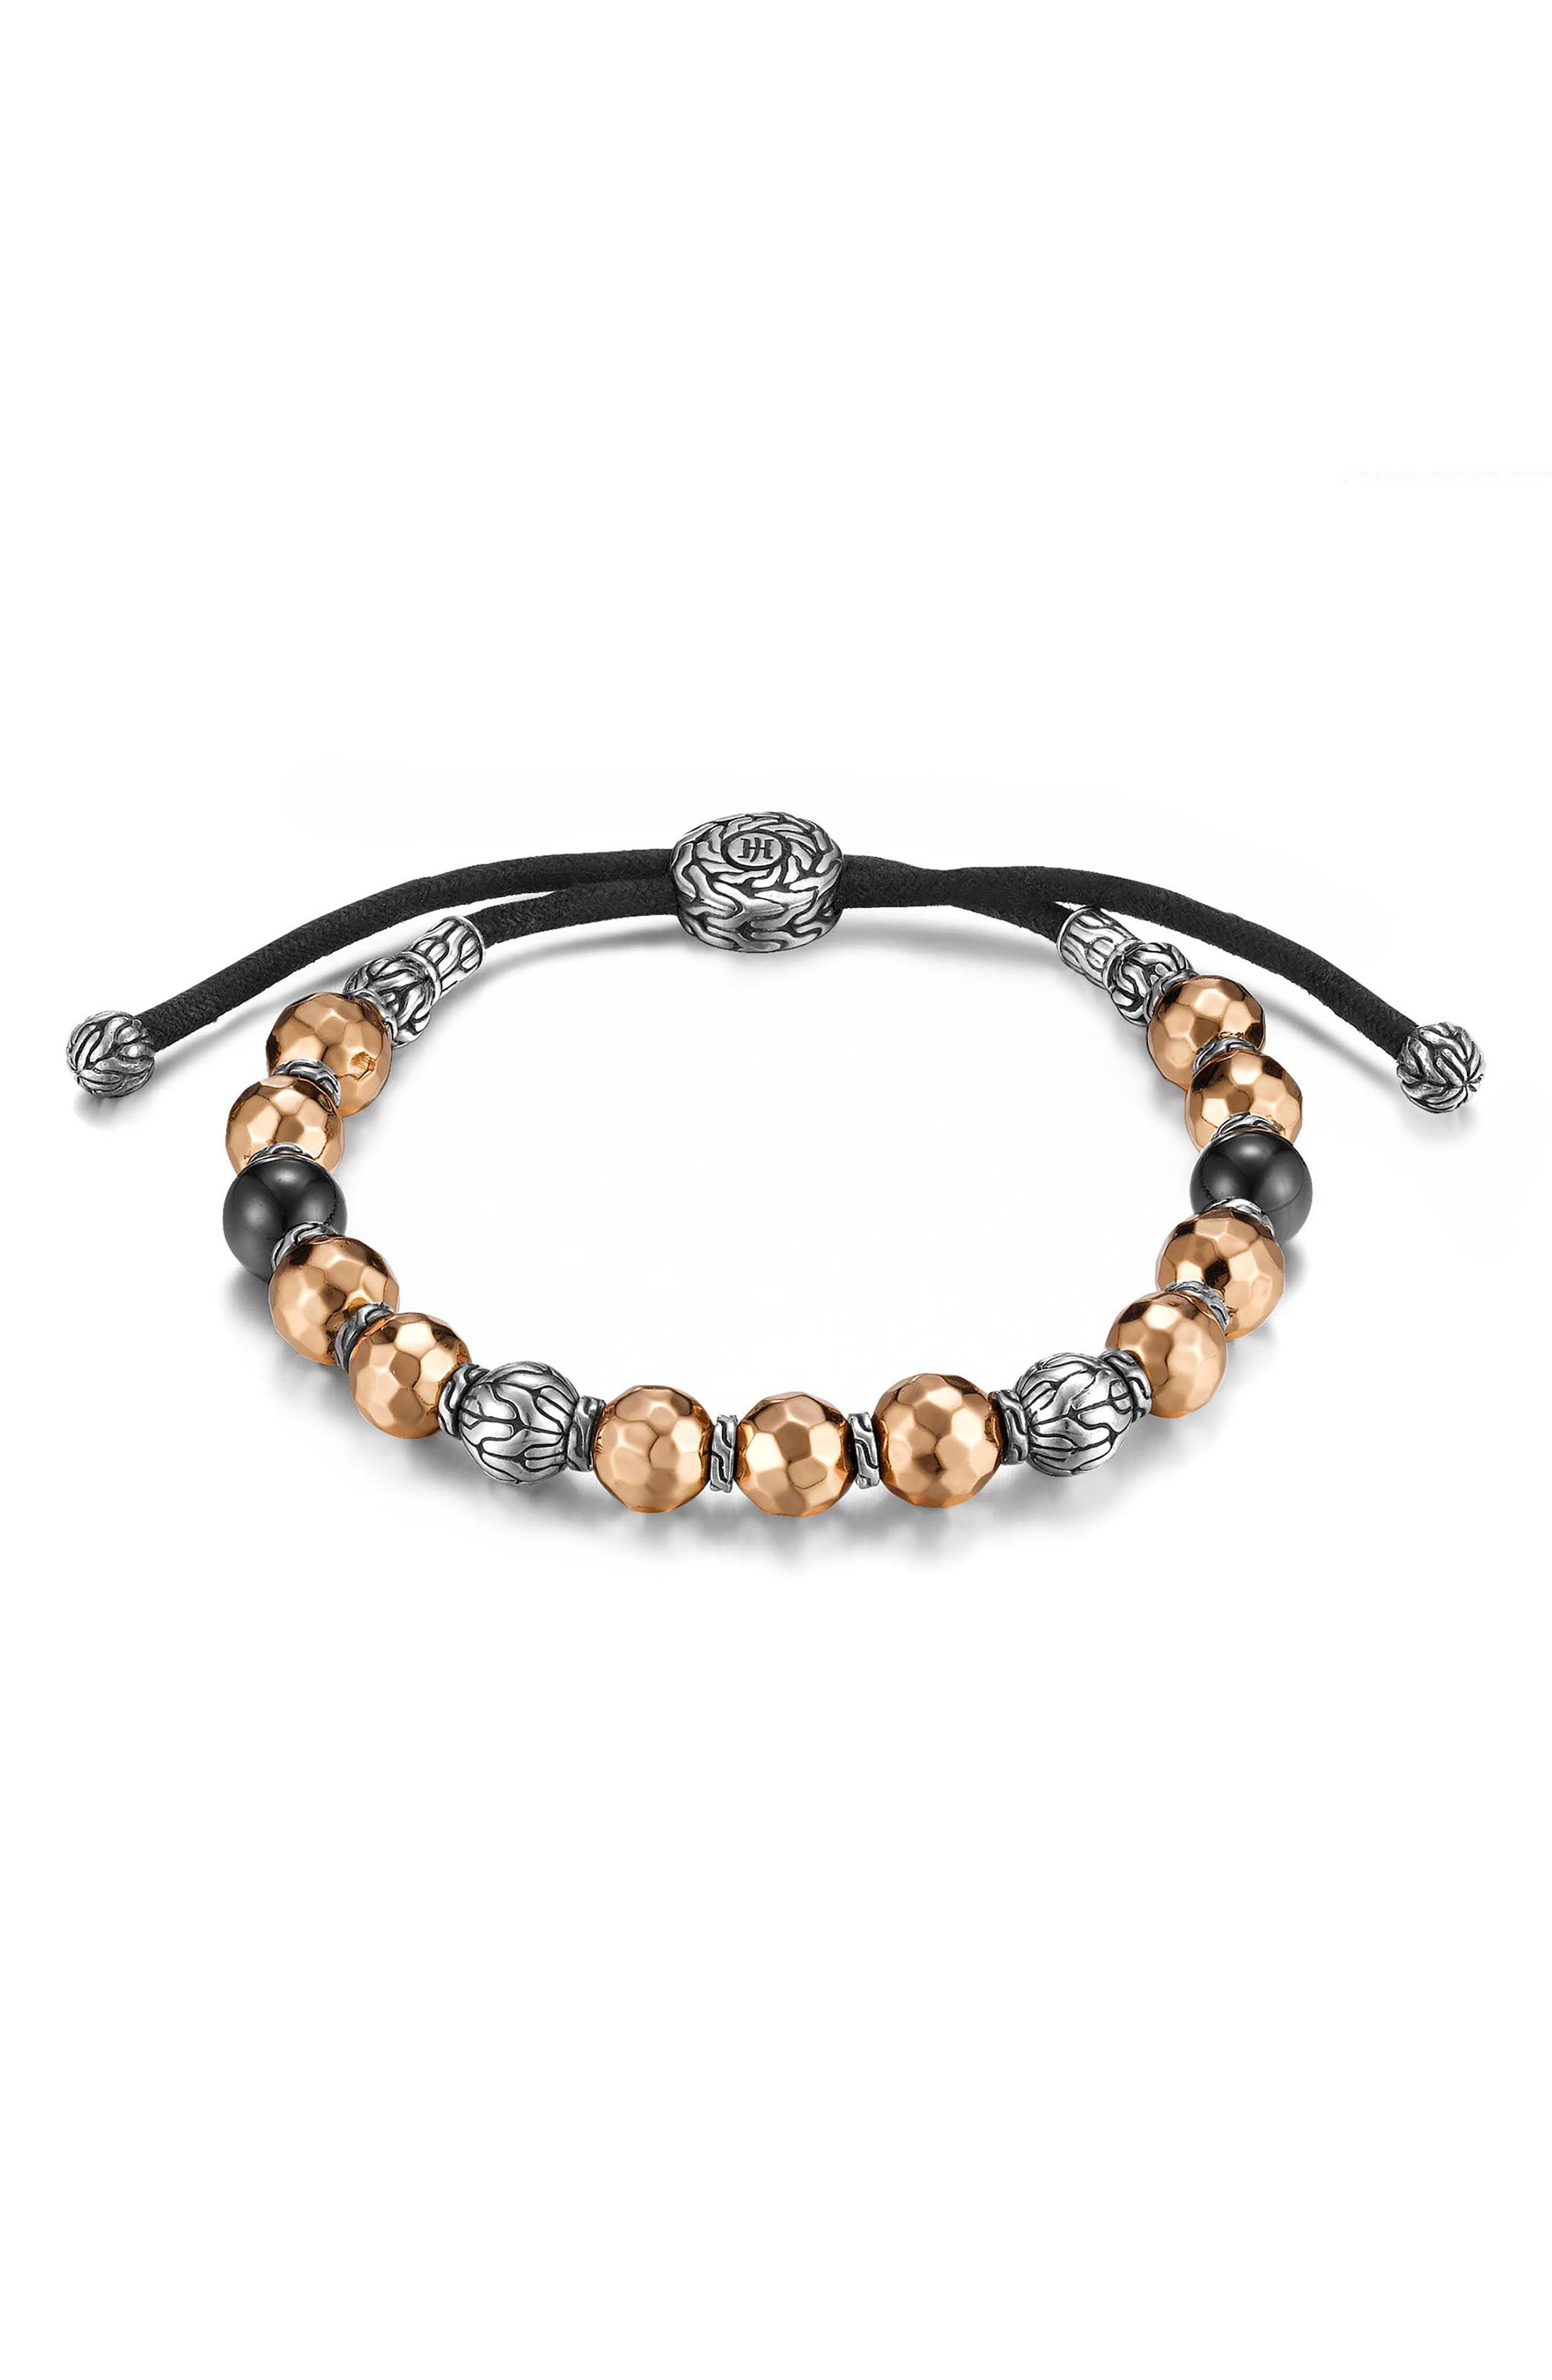 Men's Hammered Bead Bracelet,                             Main thumbnail 1, color,                             Silver/ Black Tourmaline